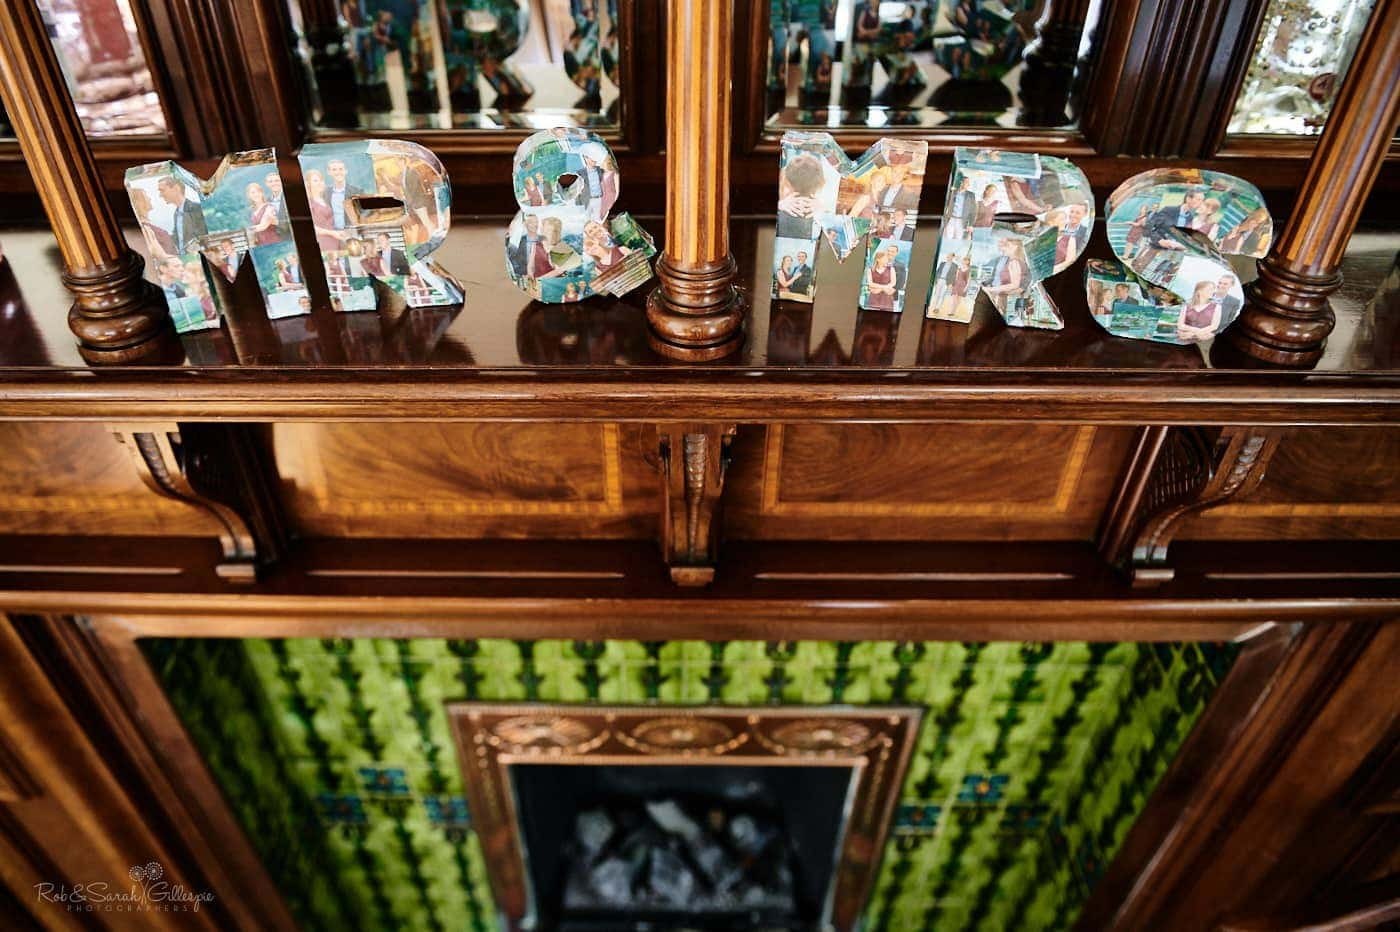 Mr & Mrs handmade sign on wooden fireplace